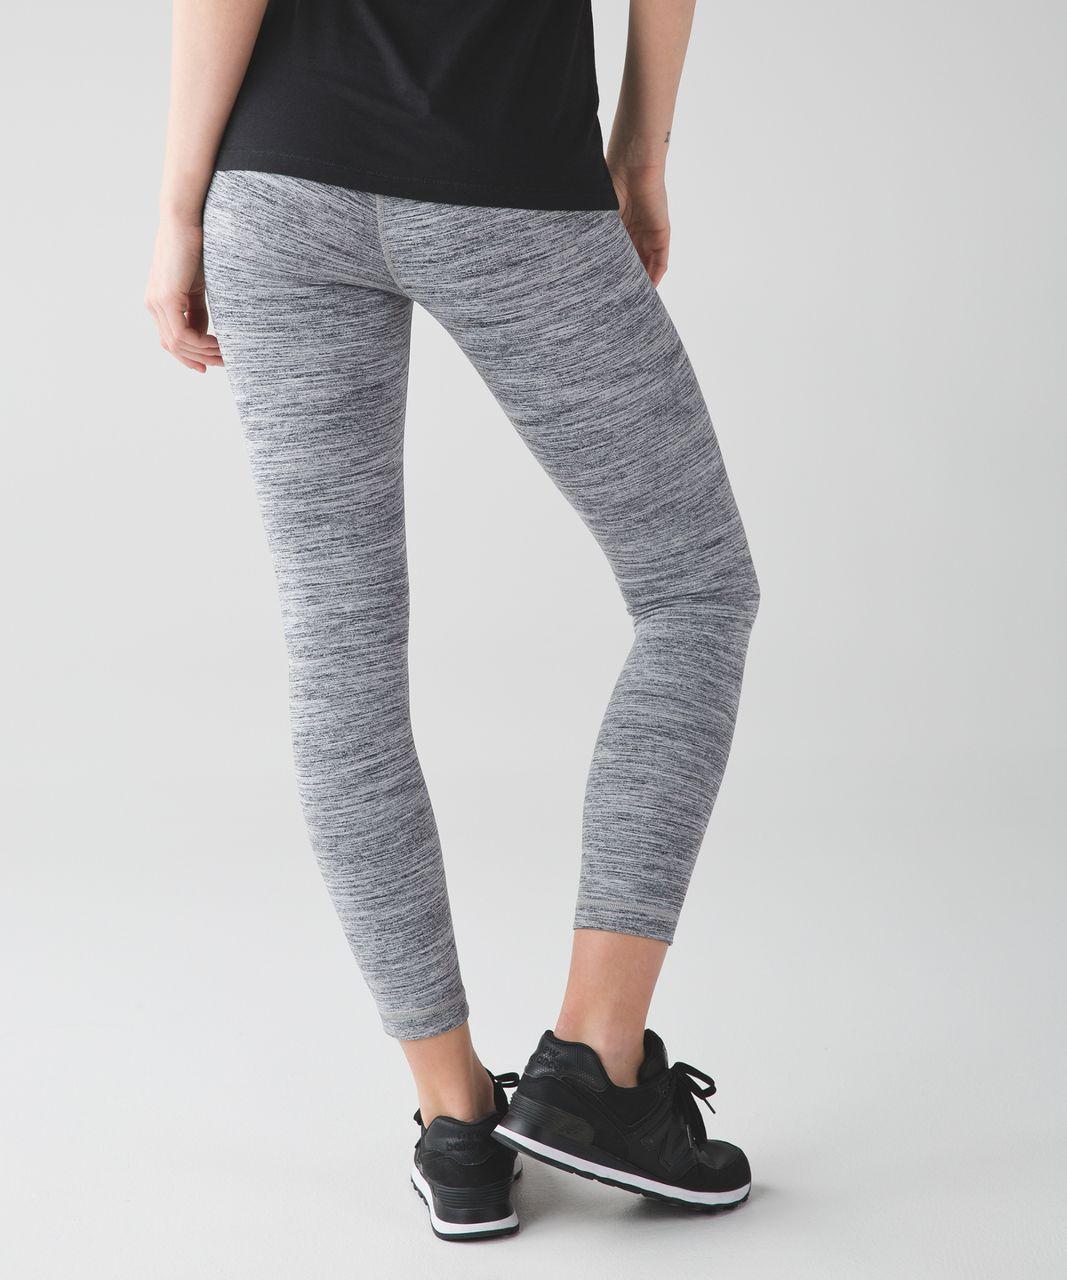 Lululemon High Times Pant - Space Dye Camo Seal Grey Deep Coal